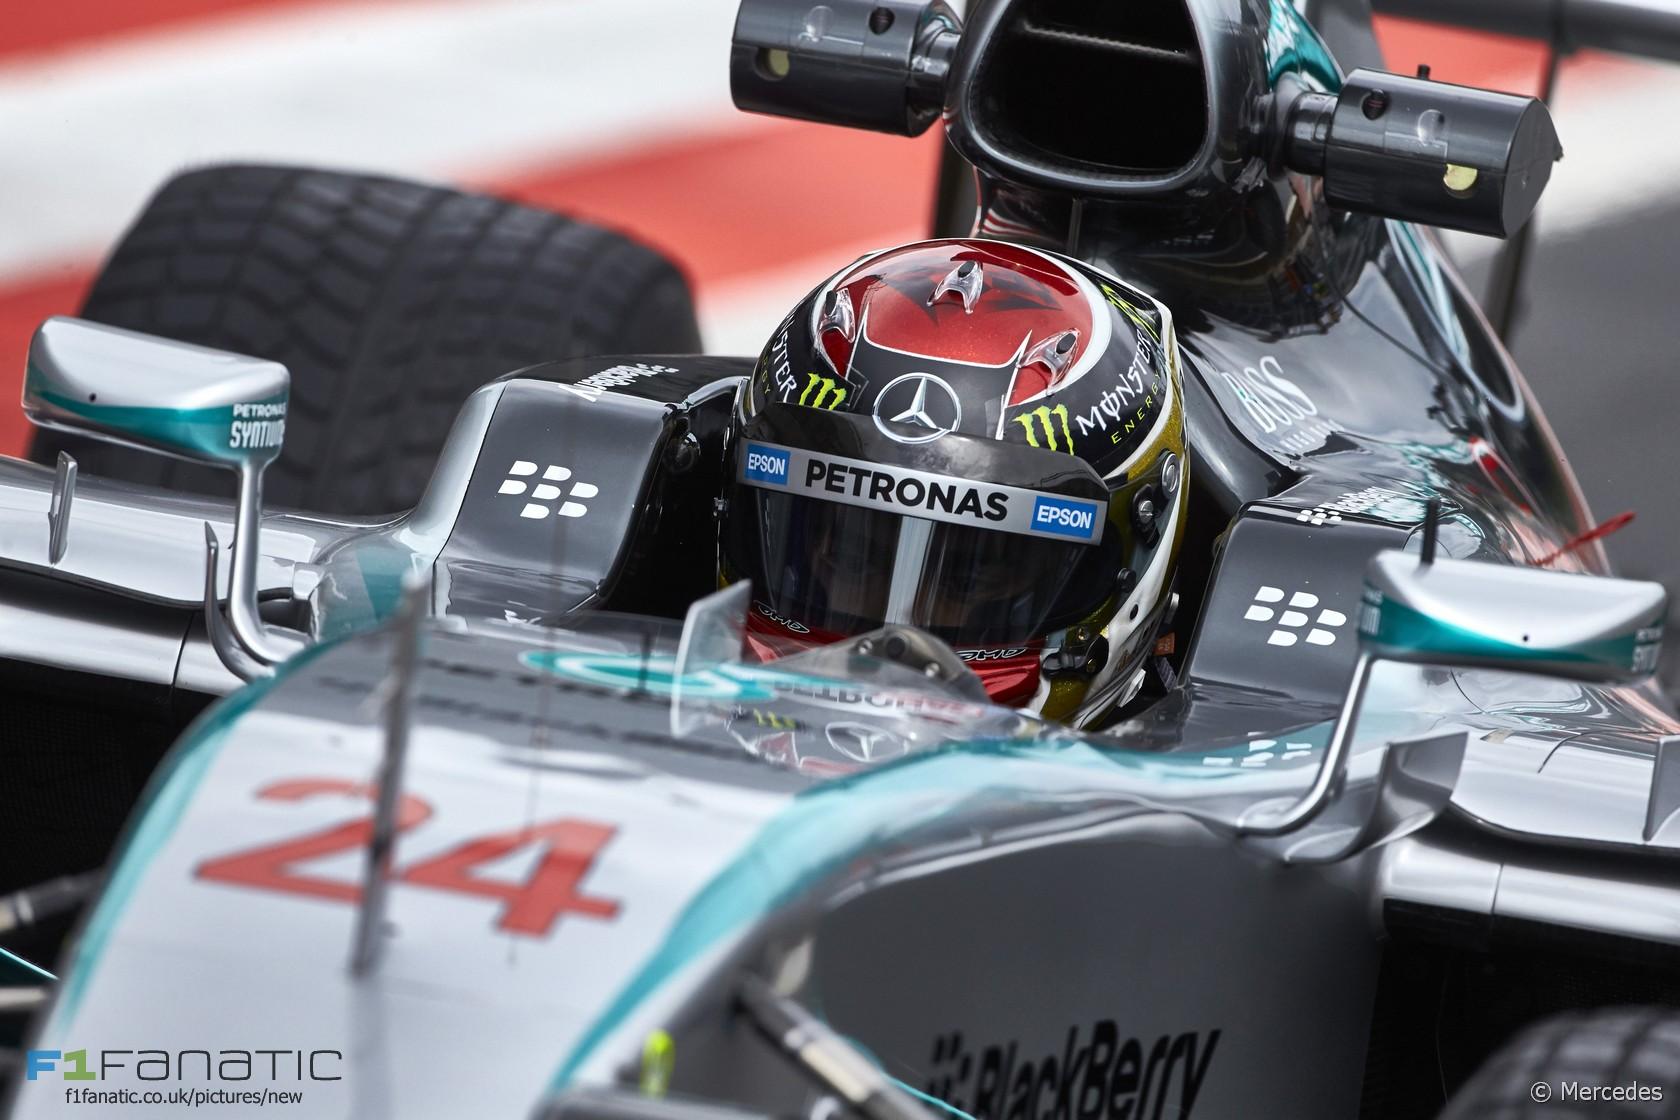 Pascal Wehrlein, Mercedes, Red Bull Ring, 2015